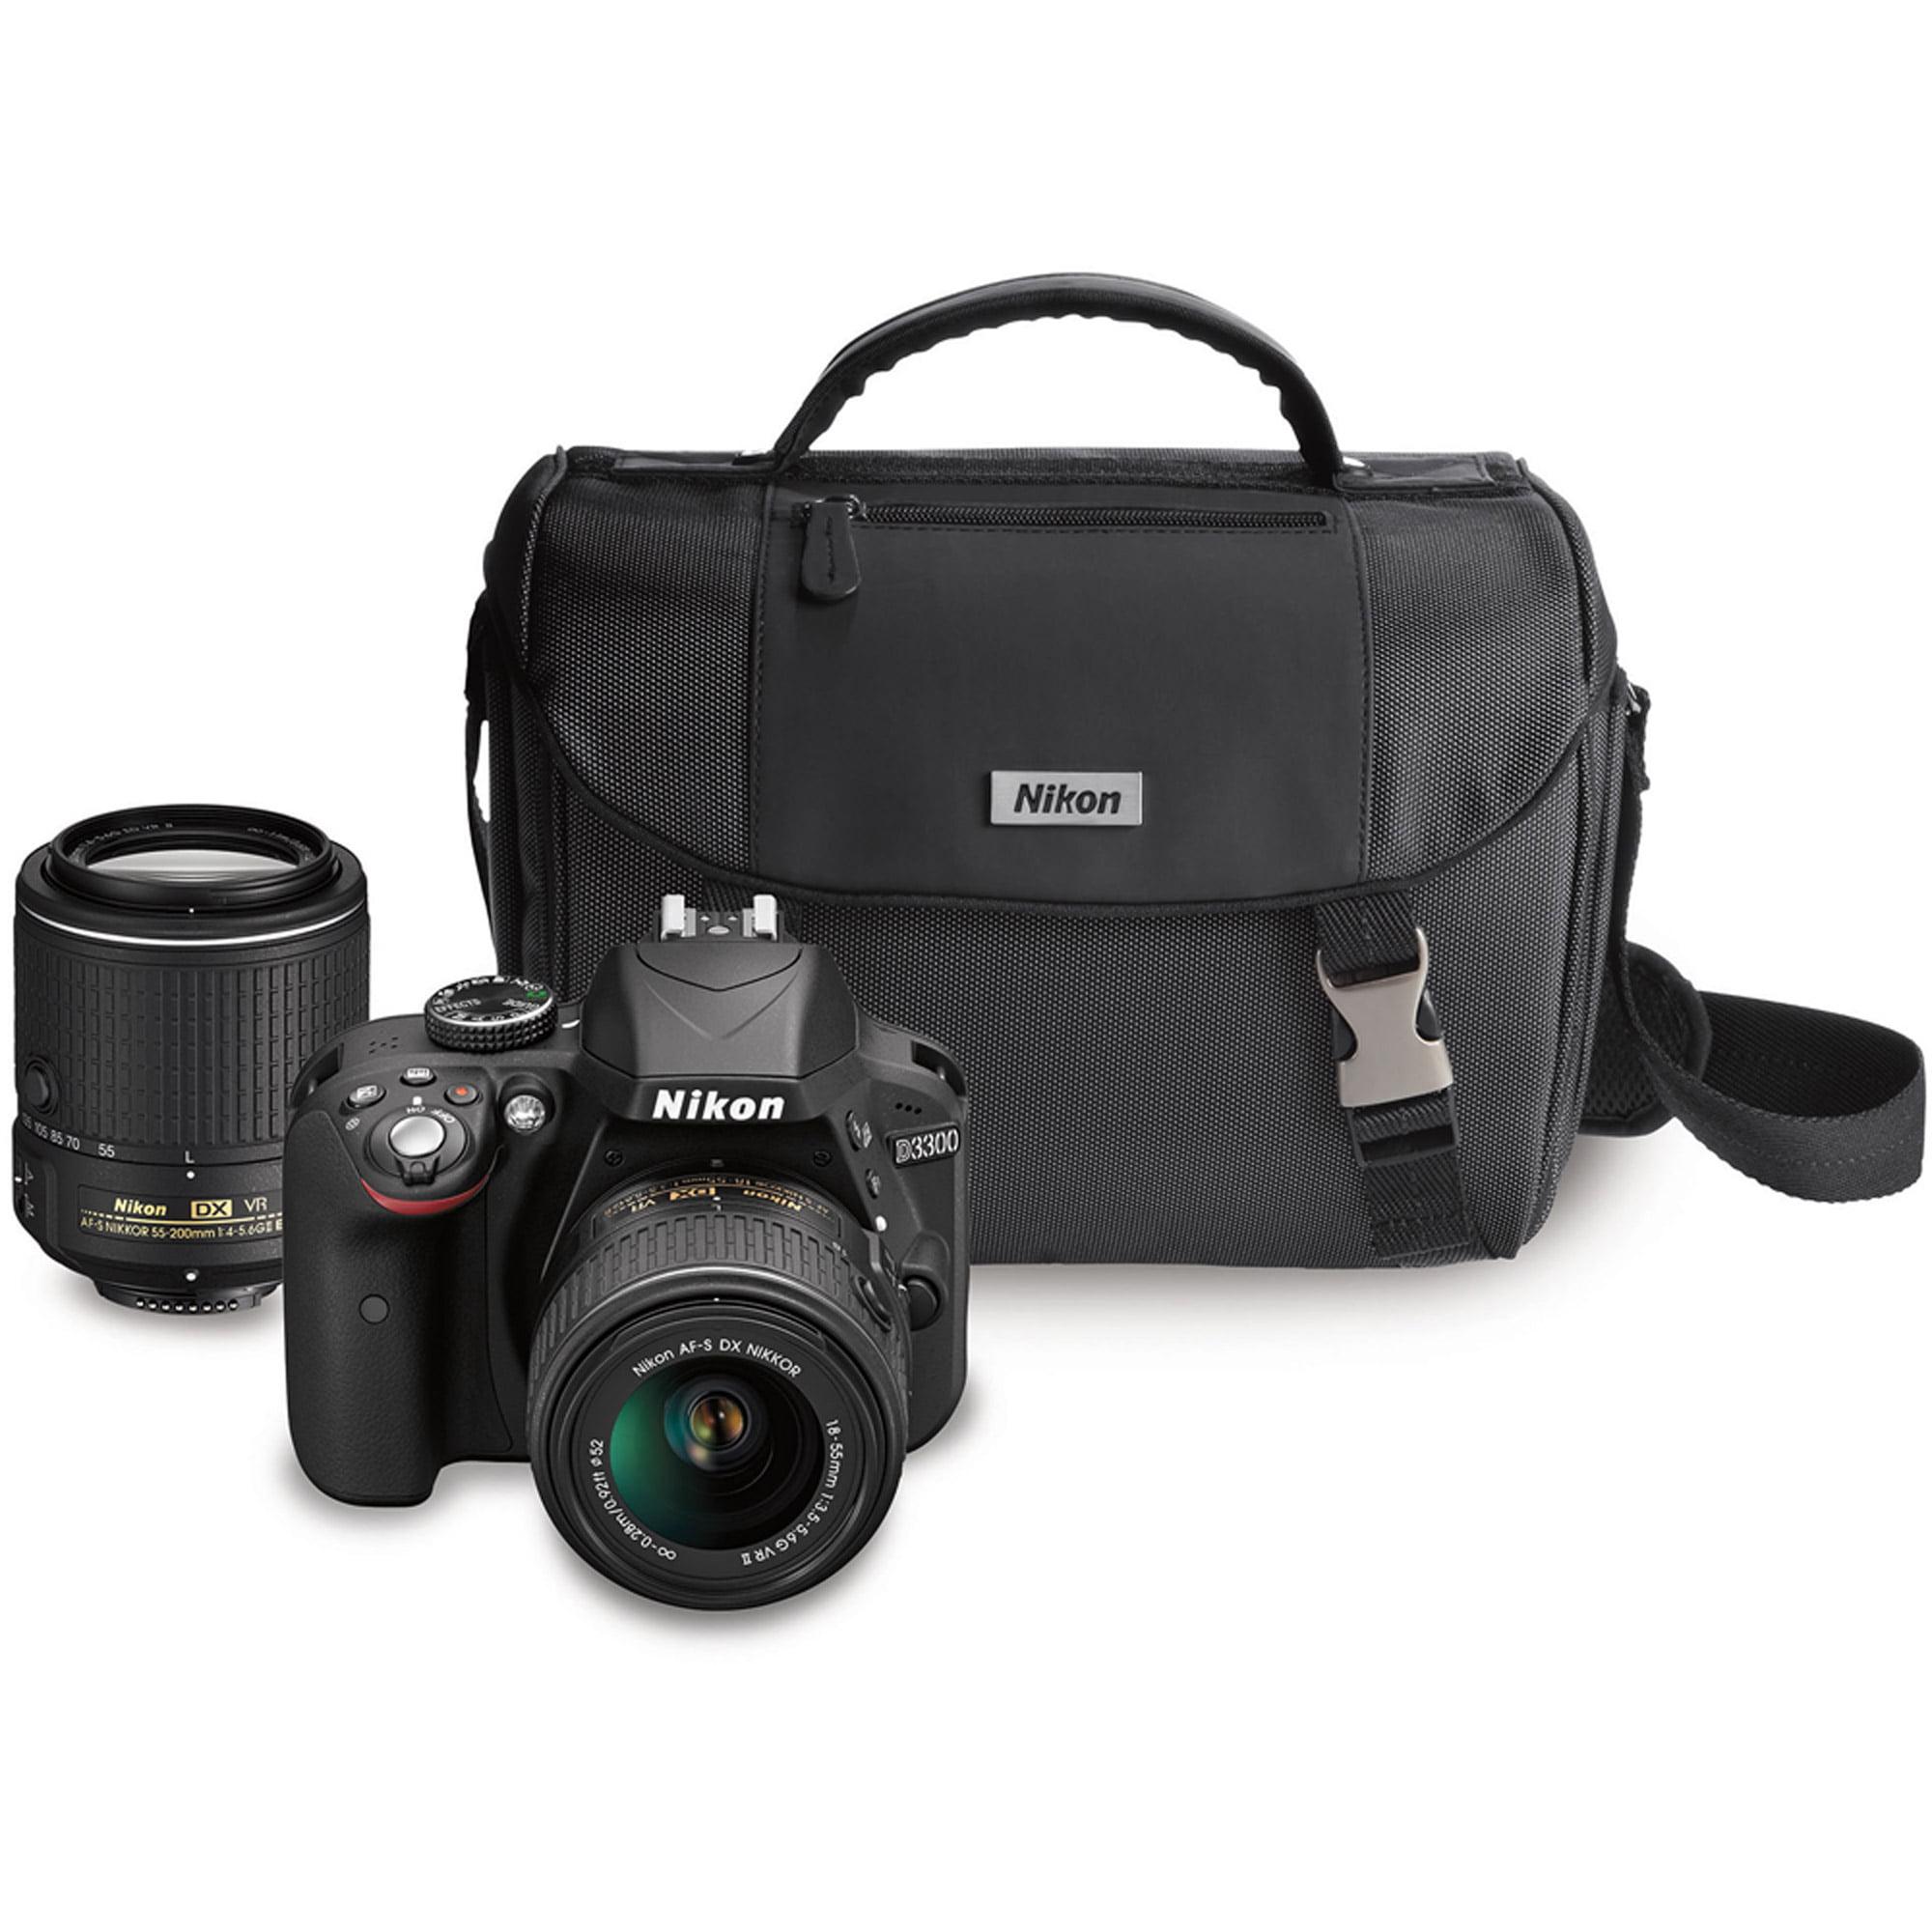 Nikon Black D3300 DX Digital SLR Camera with 24.2 Megapixels and 18-55mm and 55-200mm Lenses Included